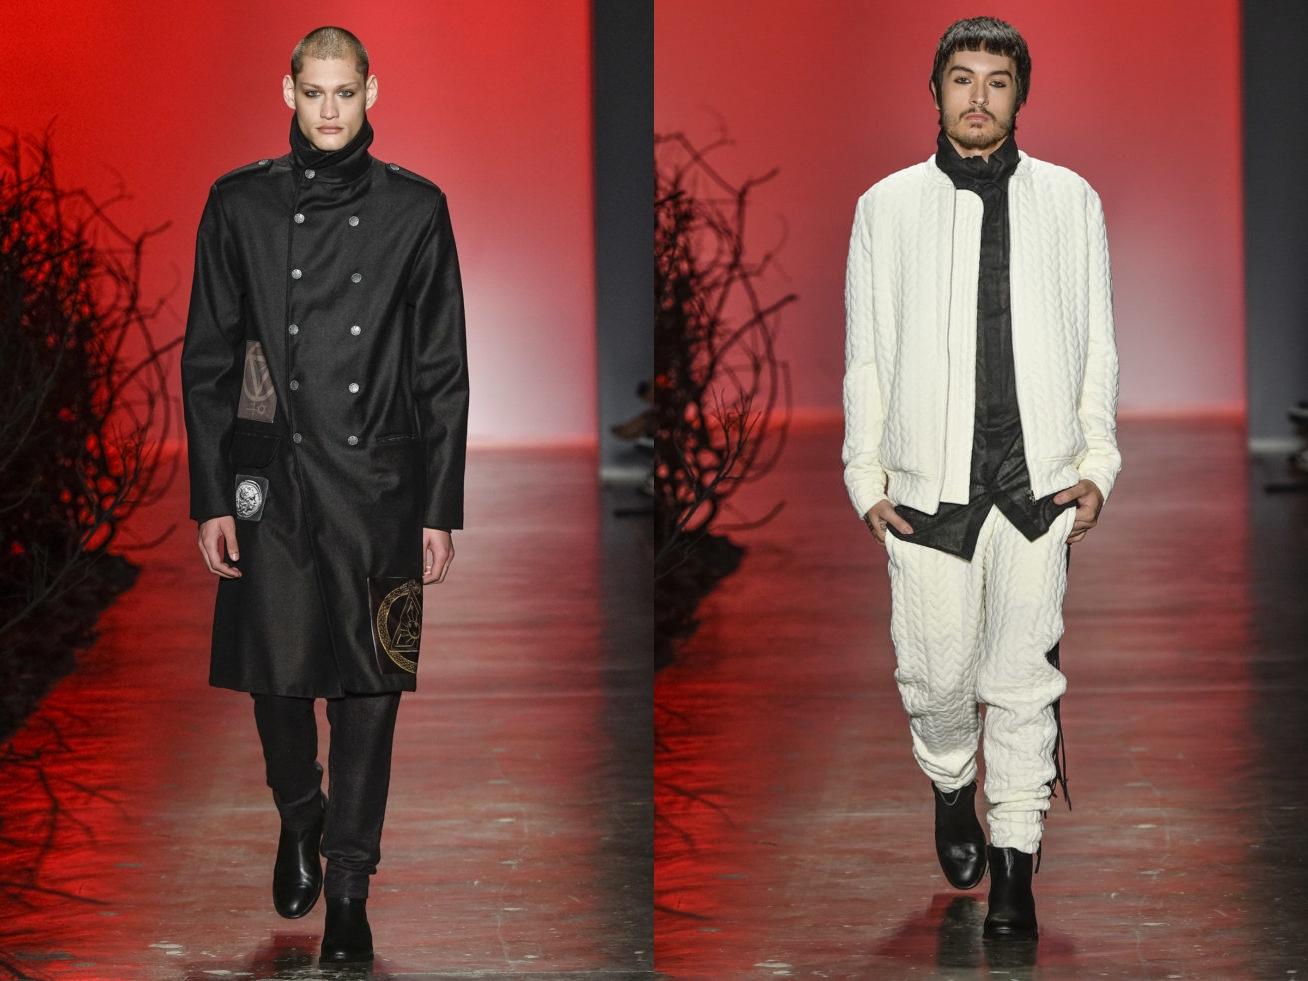 spfw n43, ratier, botina masculina 2017, bota masculina 2017, calçado masculino 2017, tendencia masculina 2017, blog de moda masculina, dicas de moda para homens, (3)